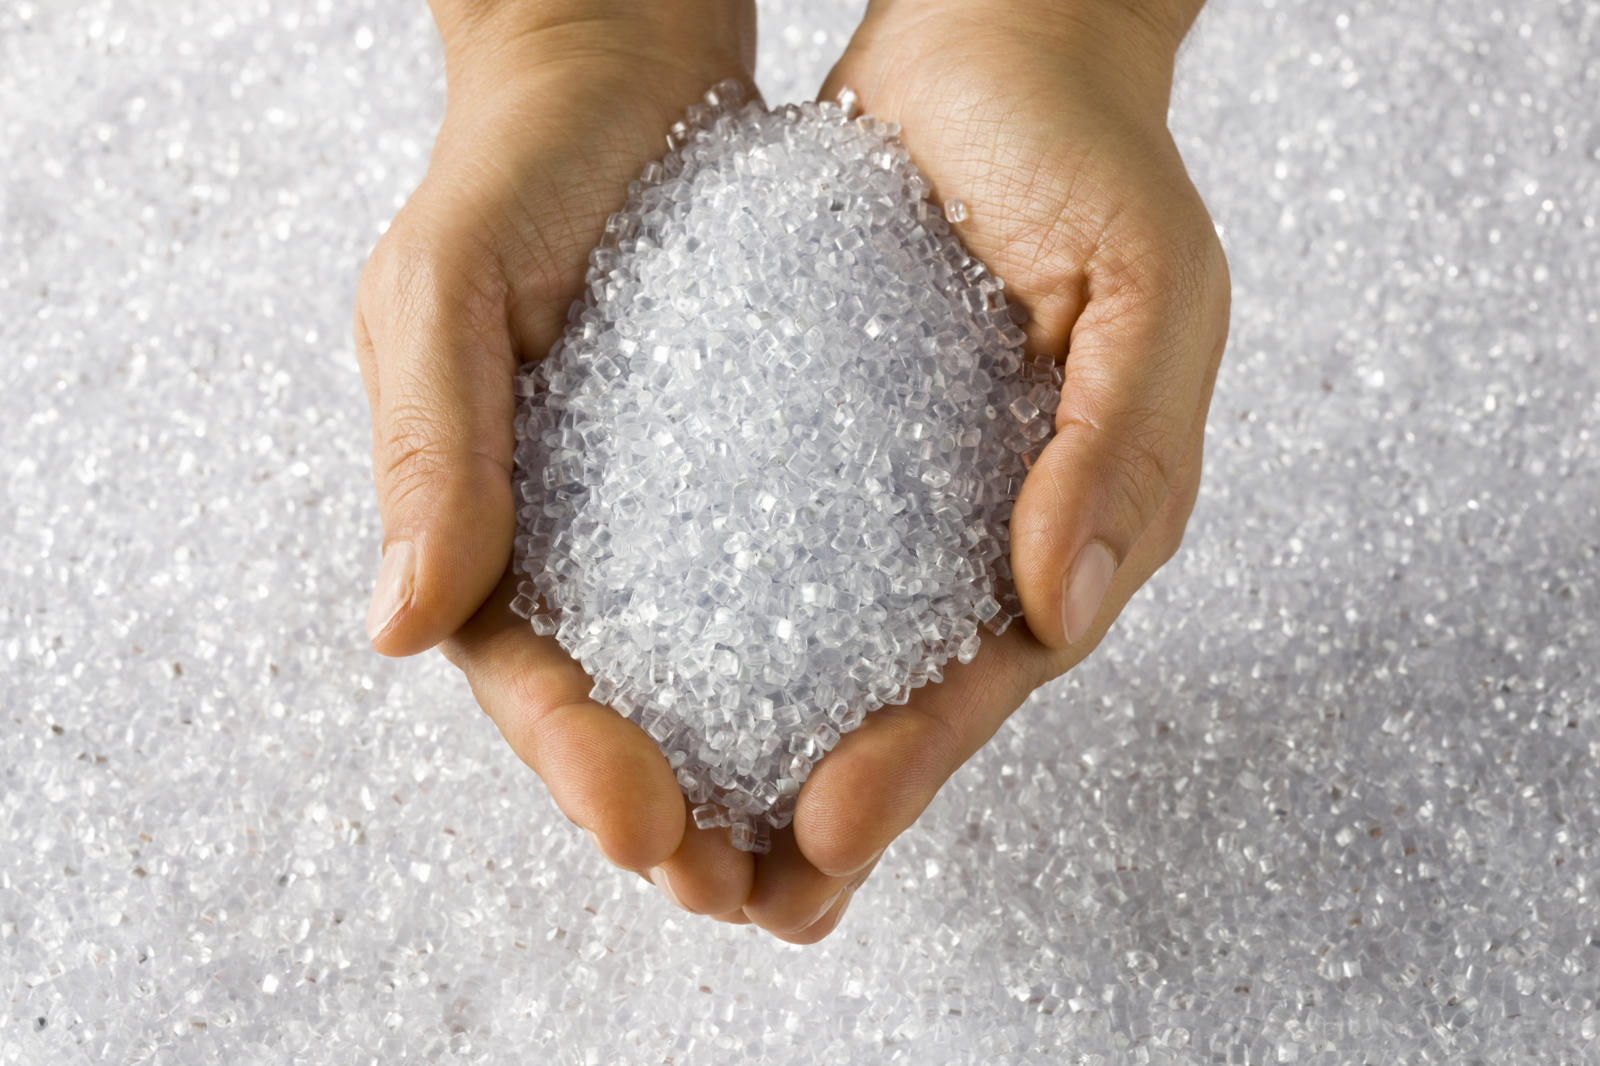 pratica n 09 sintese polimeros baquelite e borracha poliss Utilizado como matéria-prima de produtos como detergente, borracha sintética e náilon, o benzeno está relacionado a leucemias e ao linfoma contudo, apesar de.